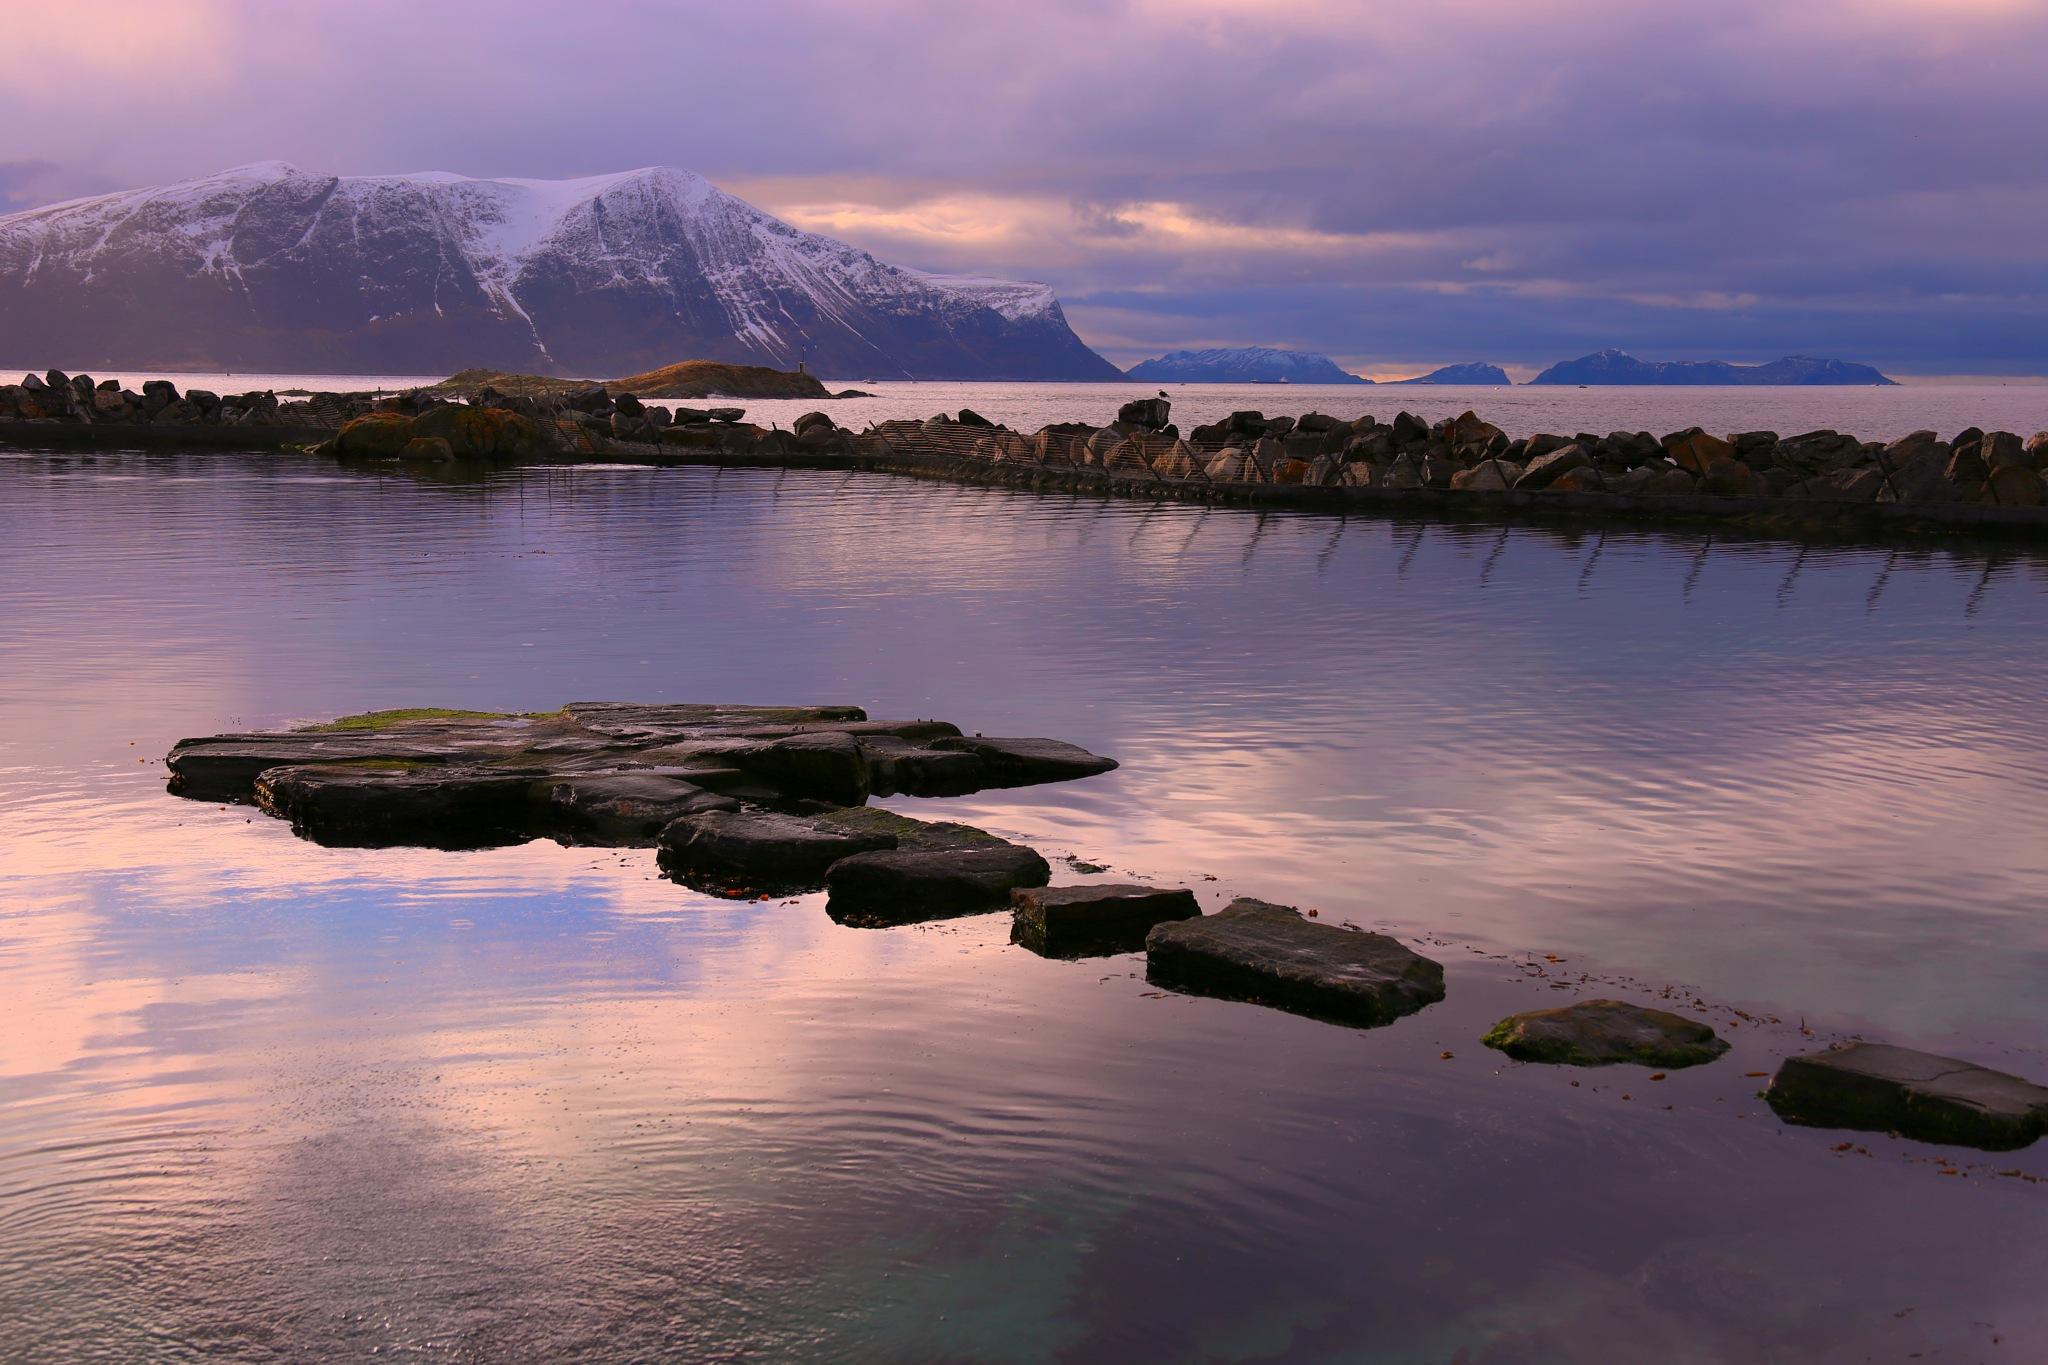 Ålesund 02.18 by Abdelmuhaymin